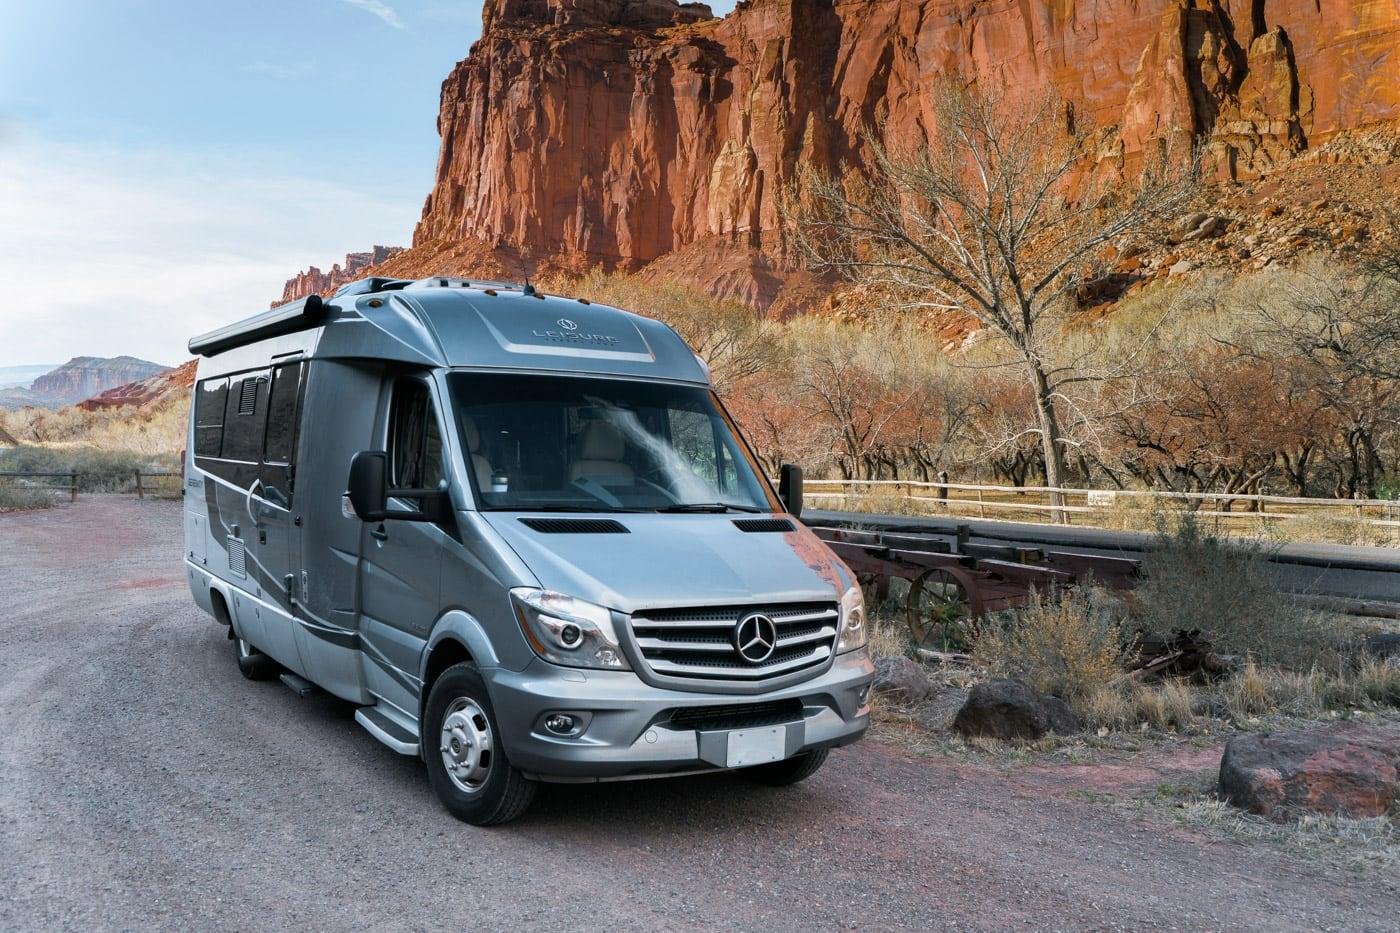 The 2017 Photo Contest Winners - Leisure Travel Vans